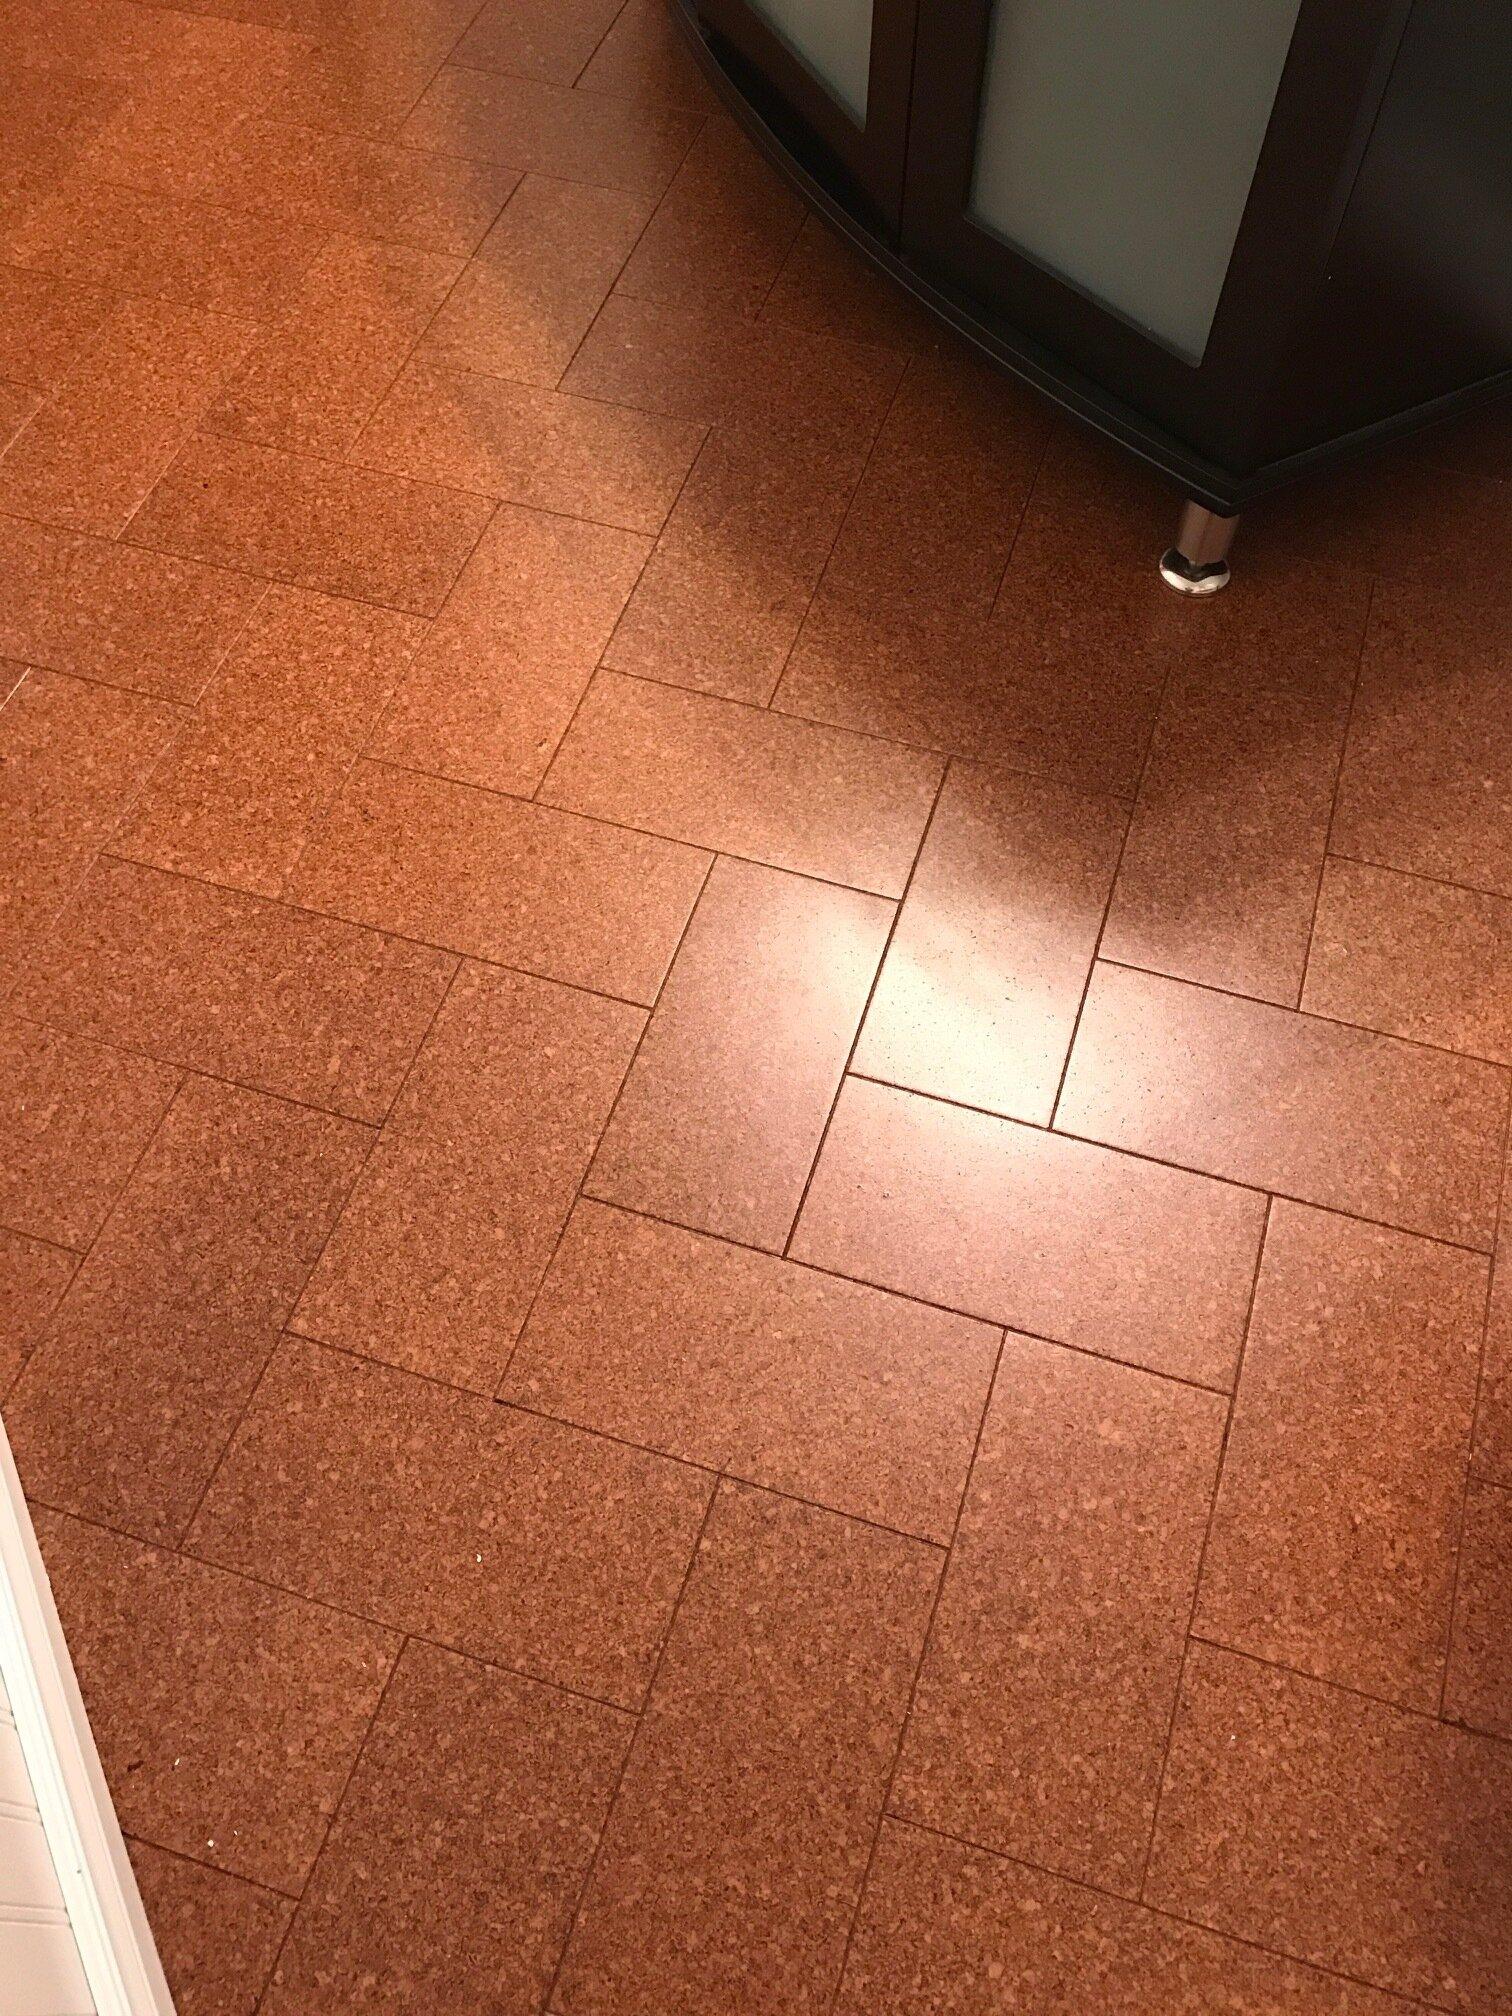 Cork Glue Down Floors Jelinek